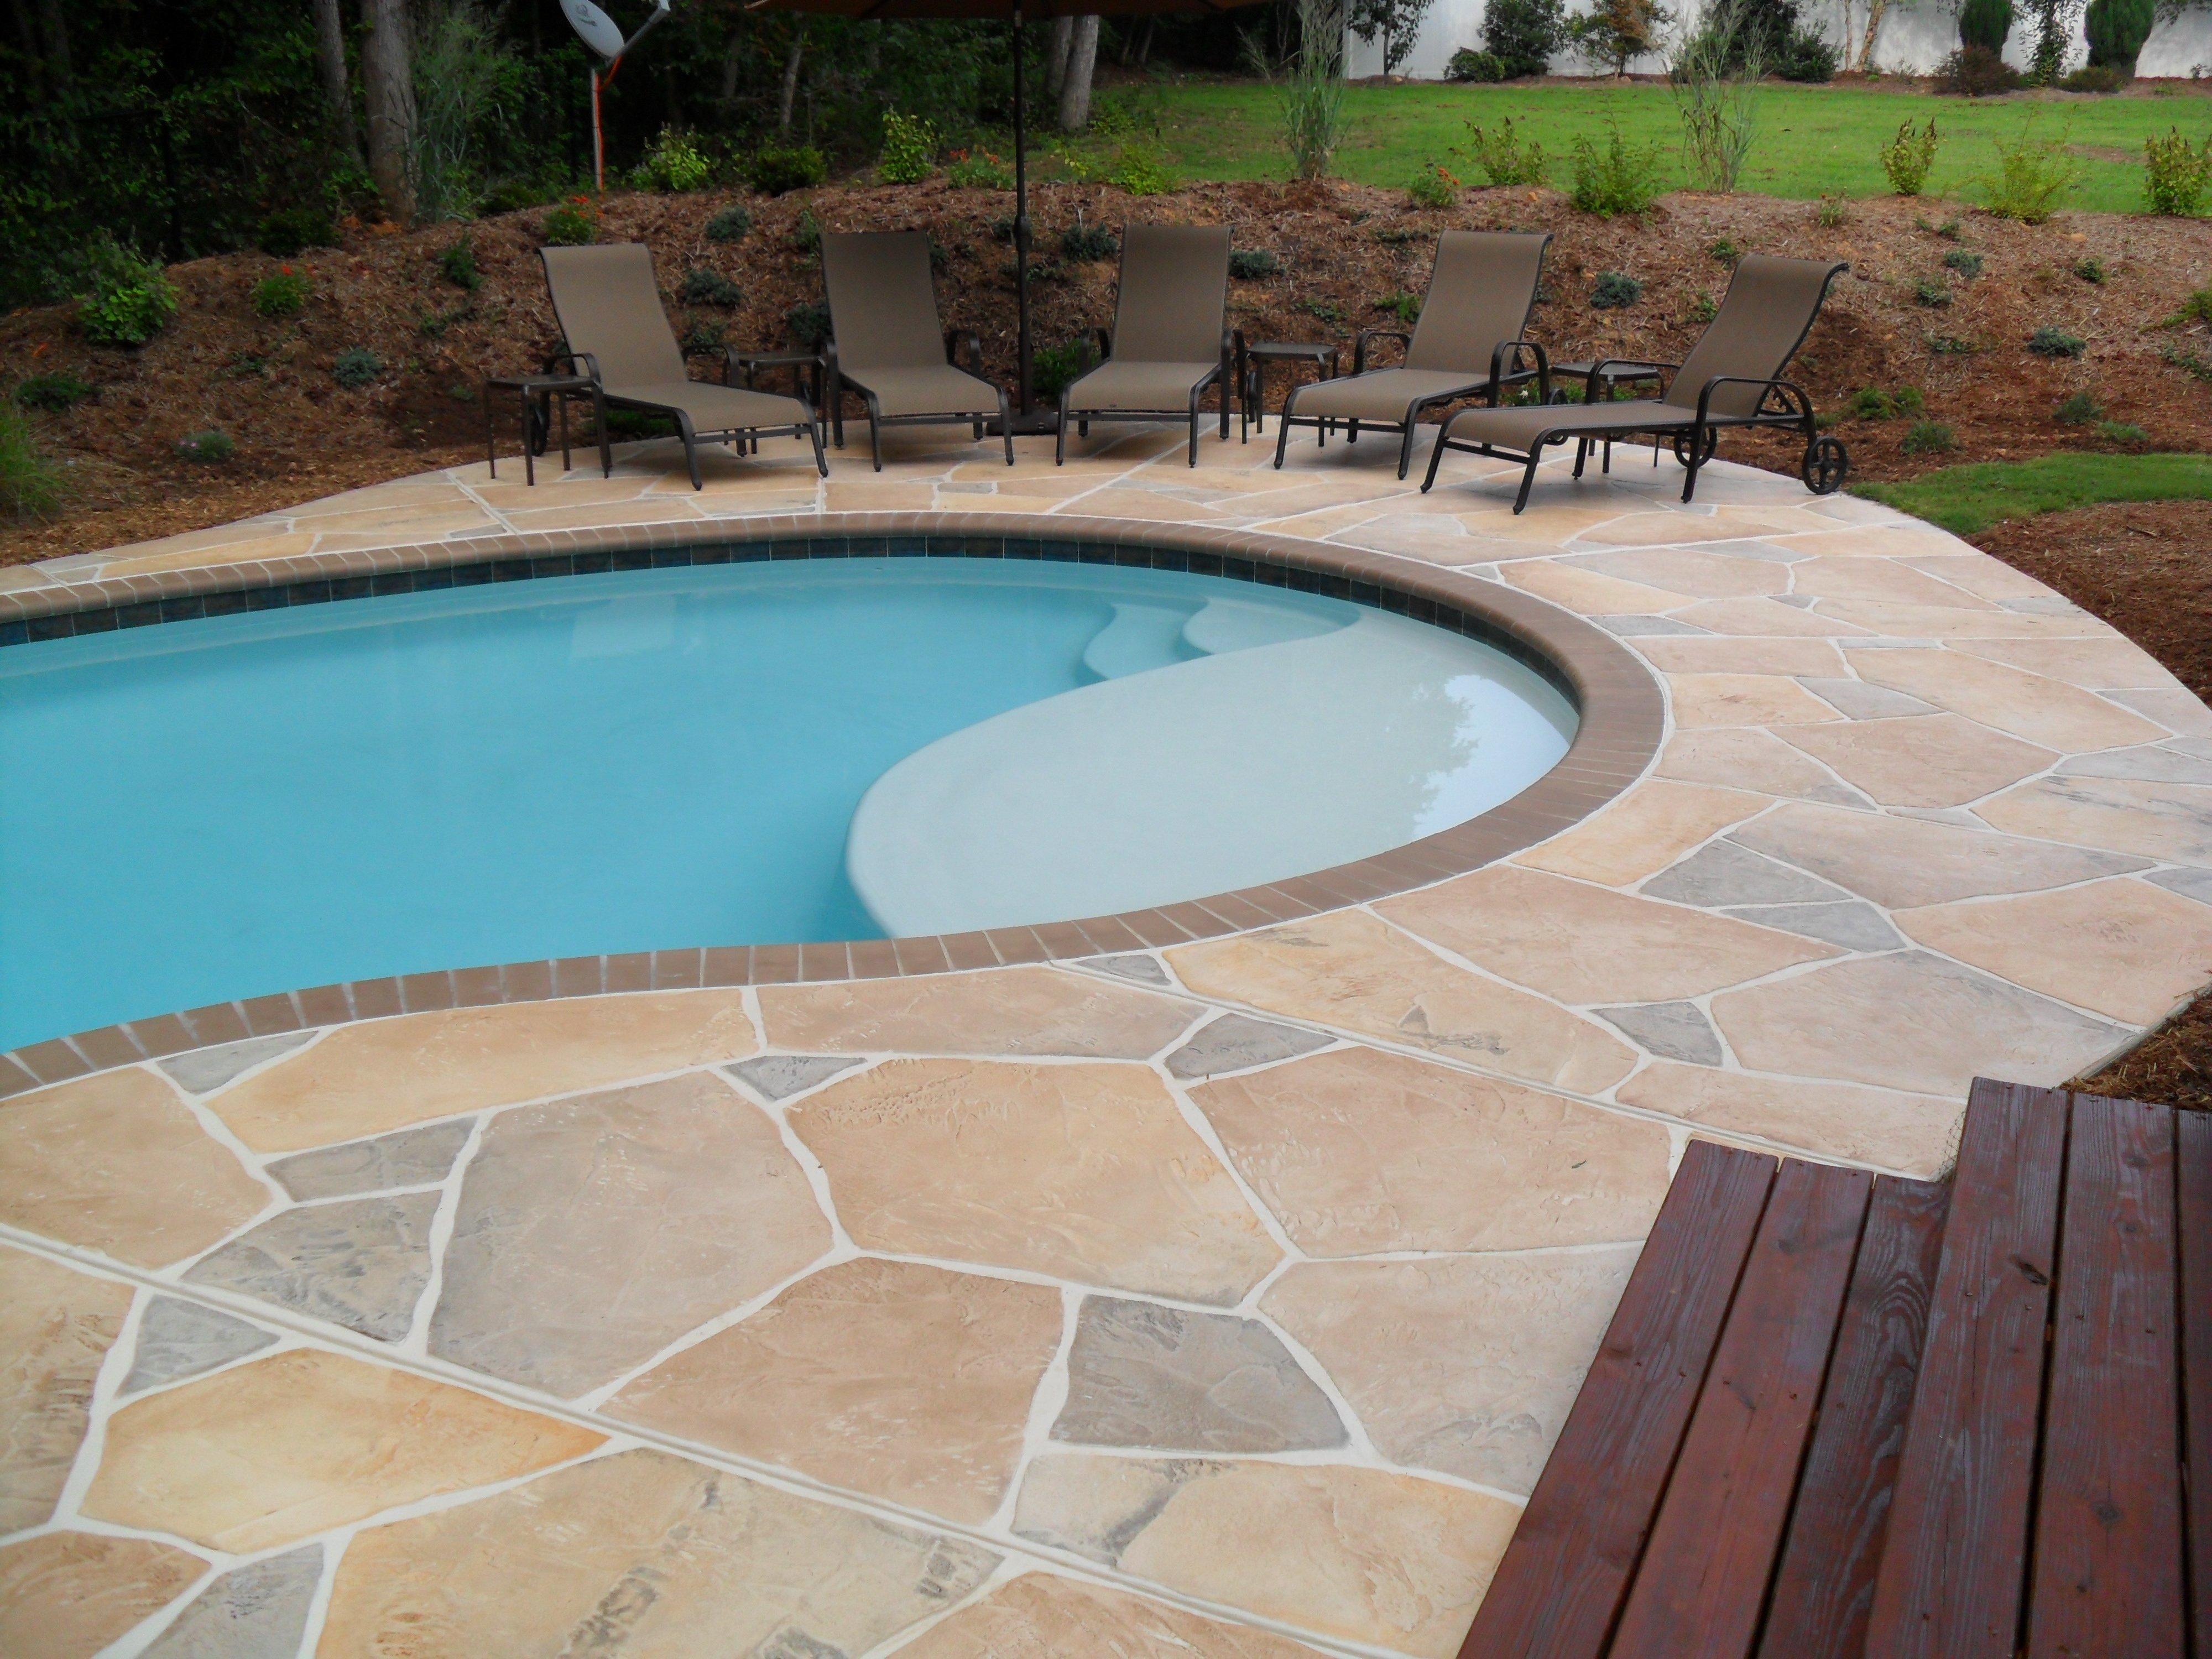 10 Elegant Pool Deck Ideas For Inground Pools concrete and flagstone pool deck designs patio clipgoo 2021